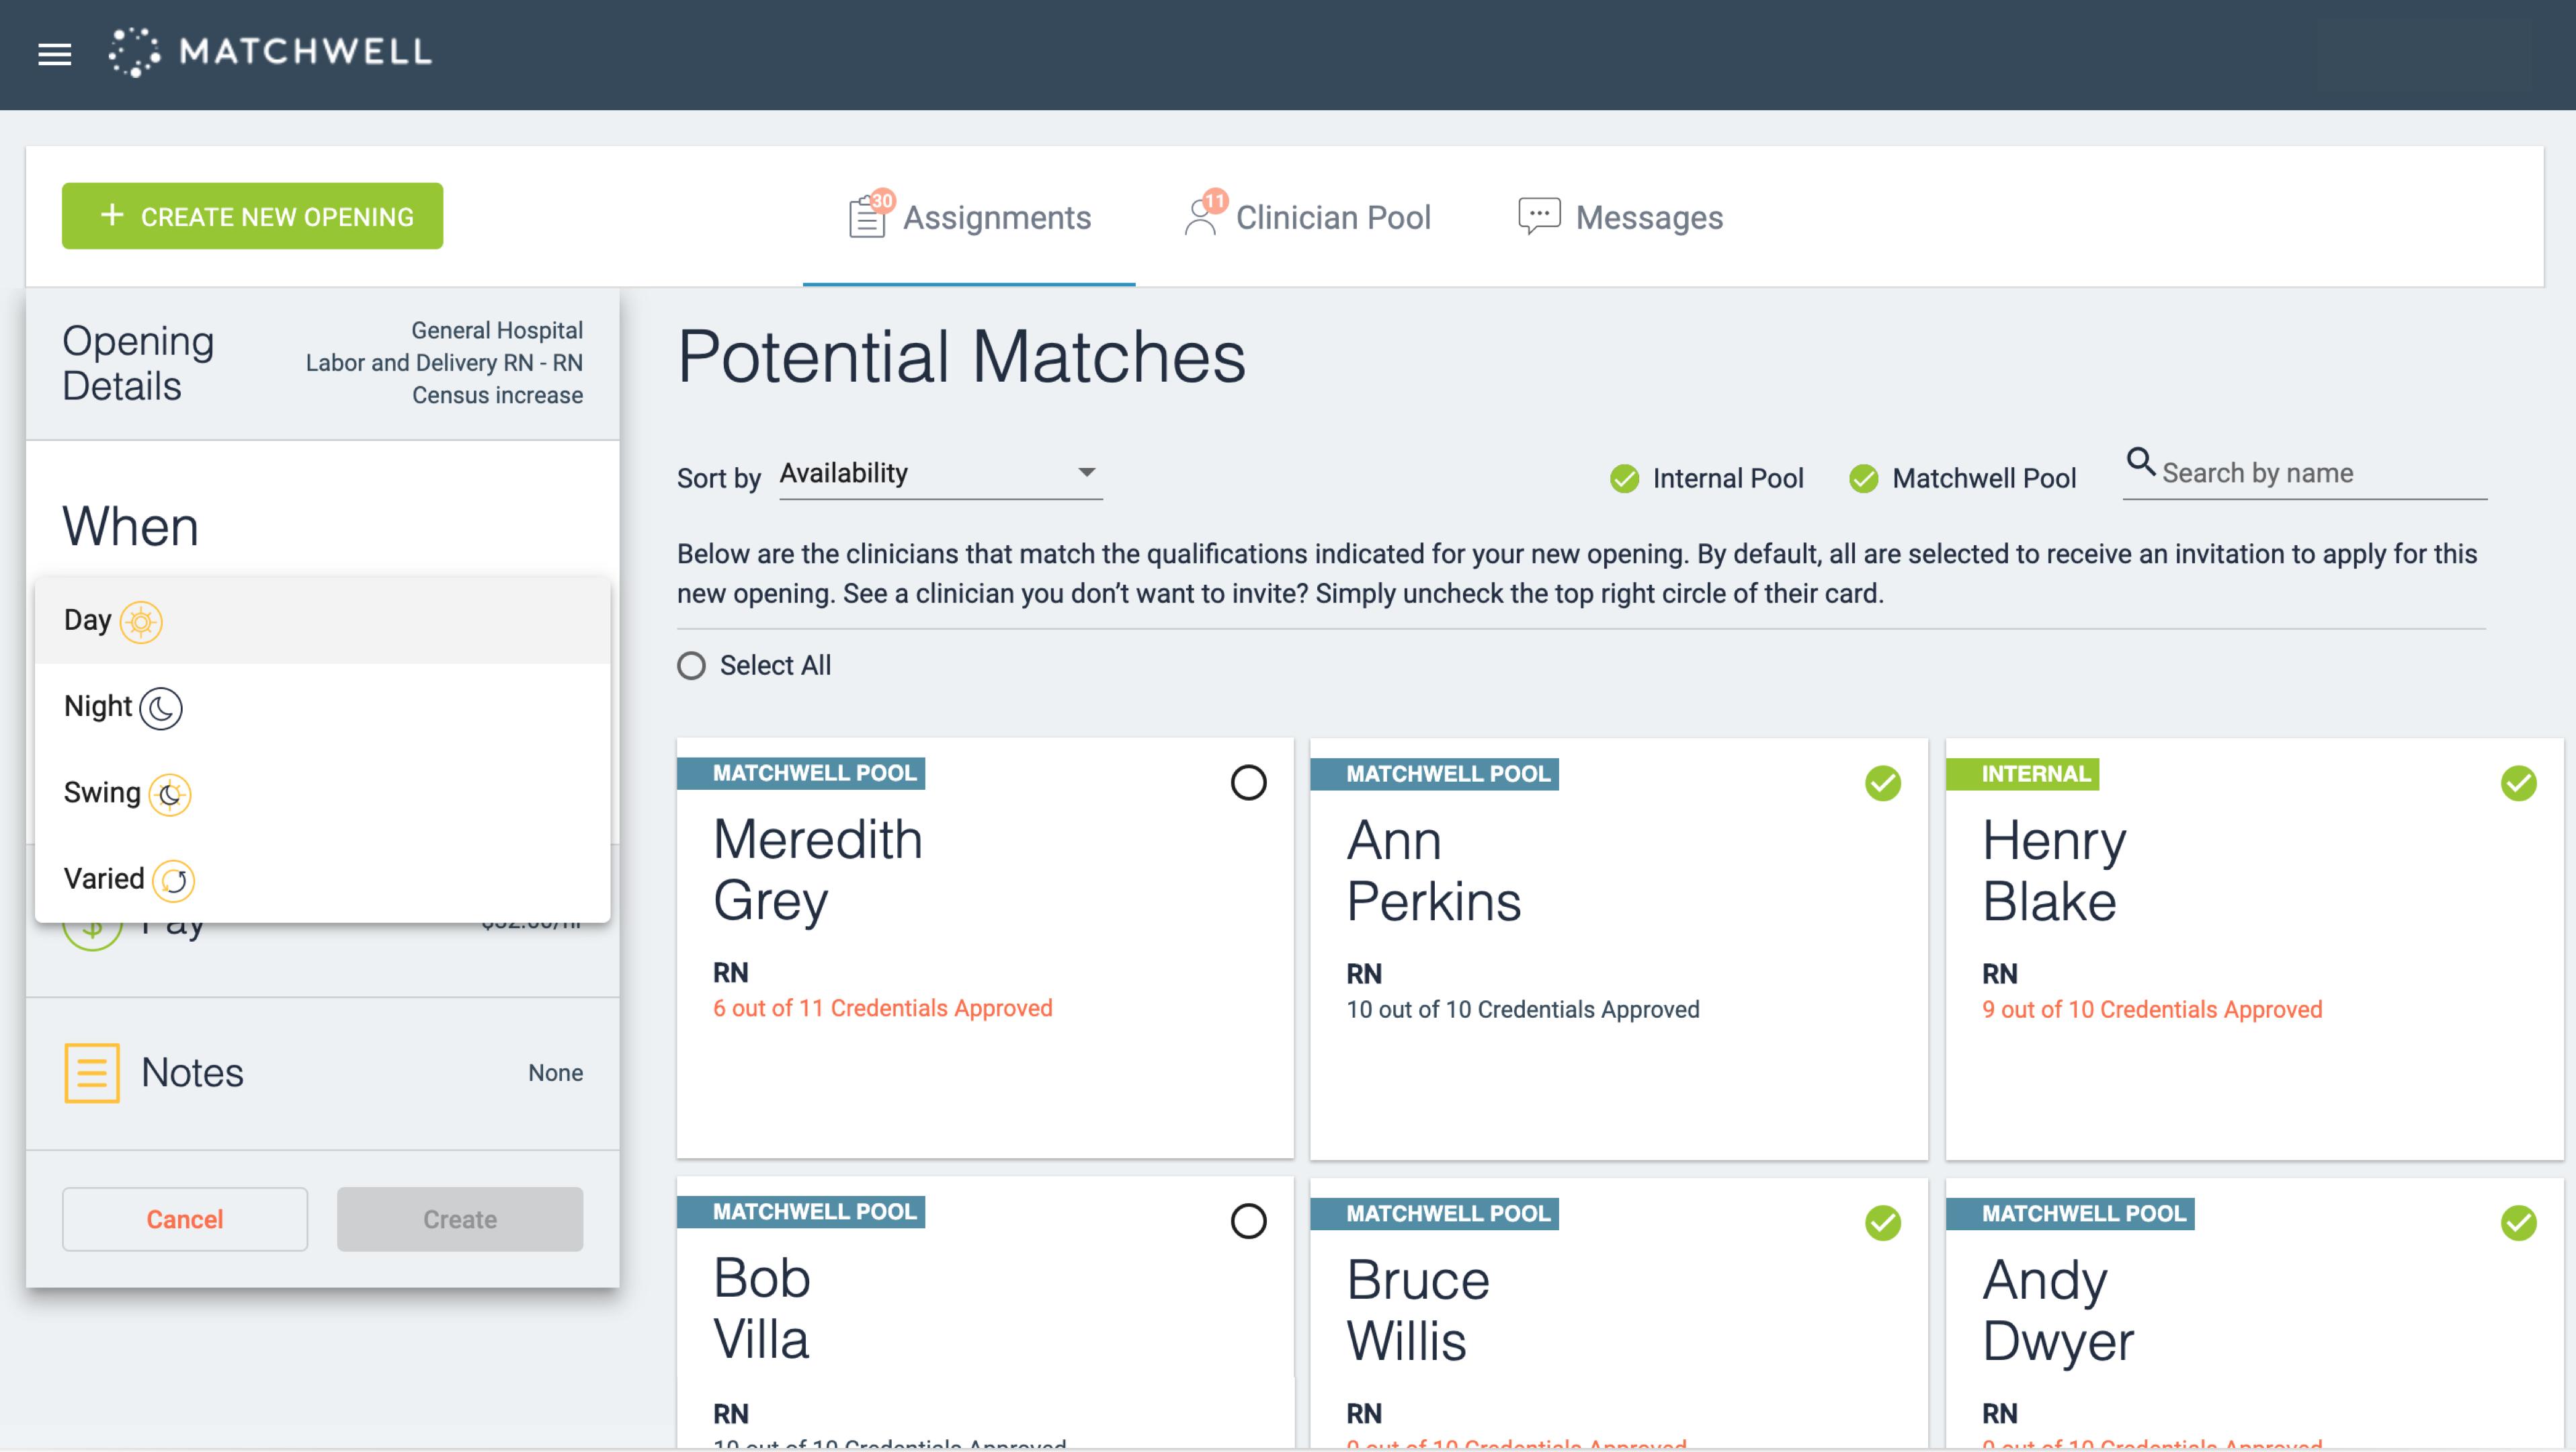 Healthcare facility view of custom web app interface